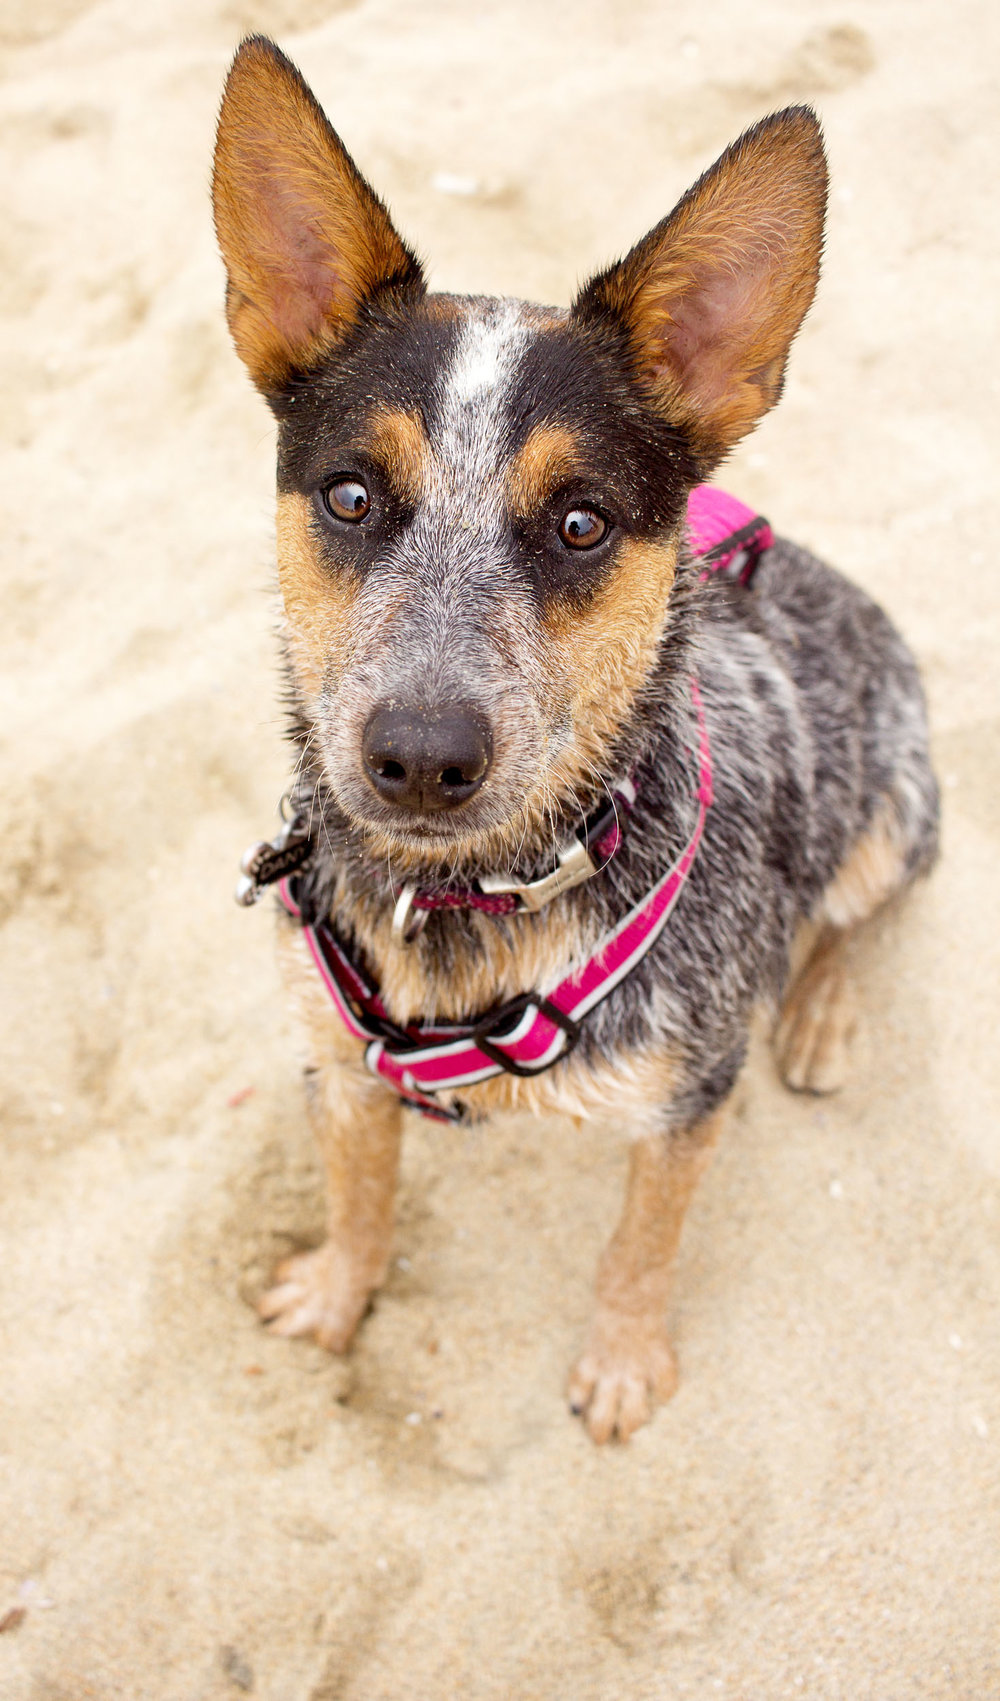 Orange-County-Dog-Photography-Pet-Huntington-Dog-Beach-SoCal-Corgi-Beach-Day_Steamer-Lee_075.JPG